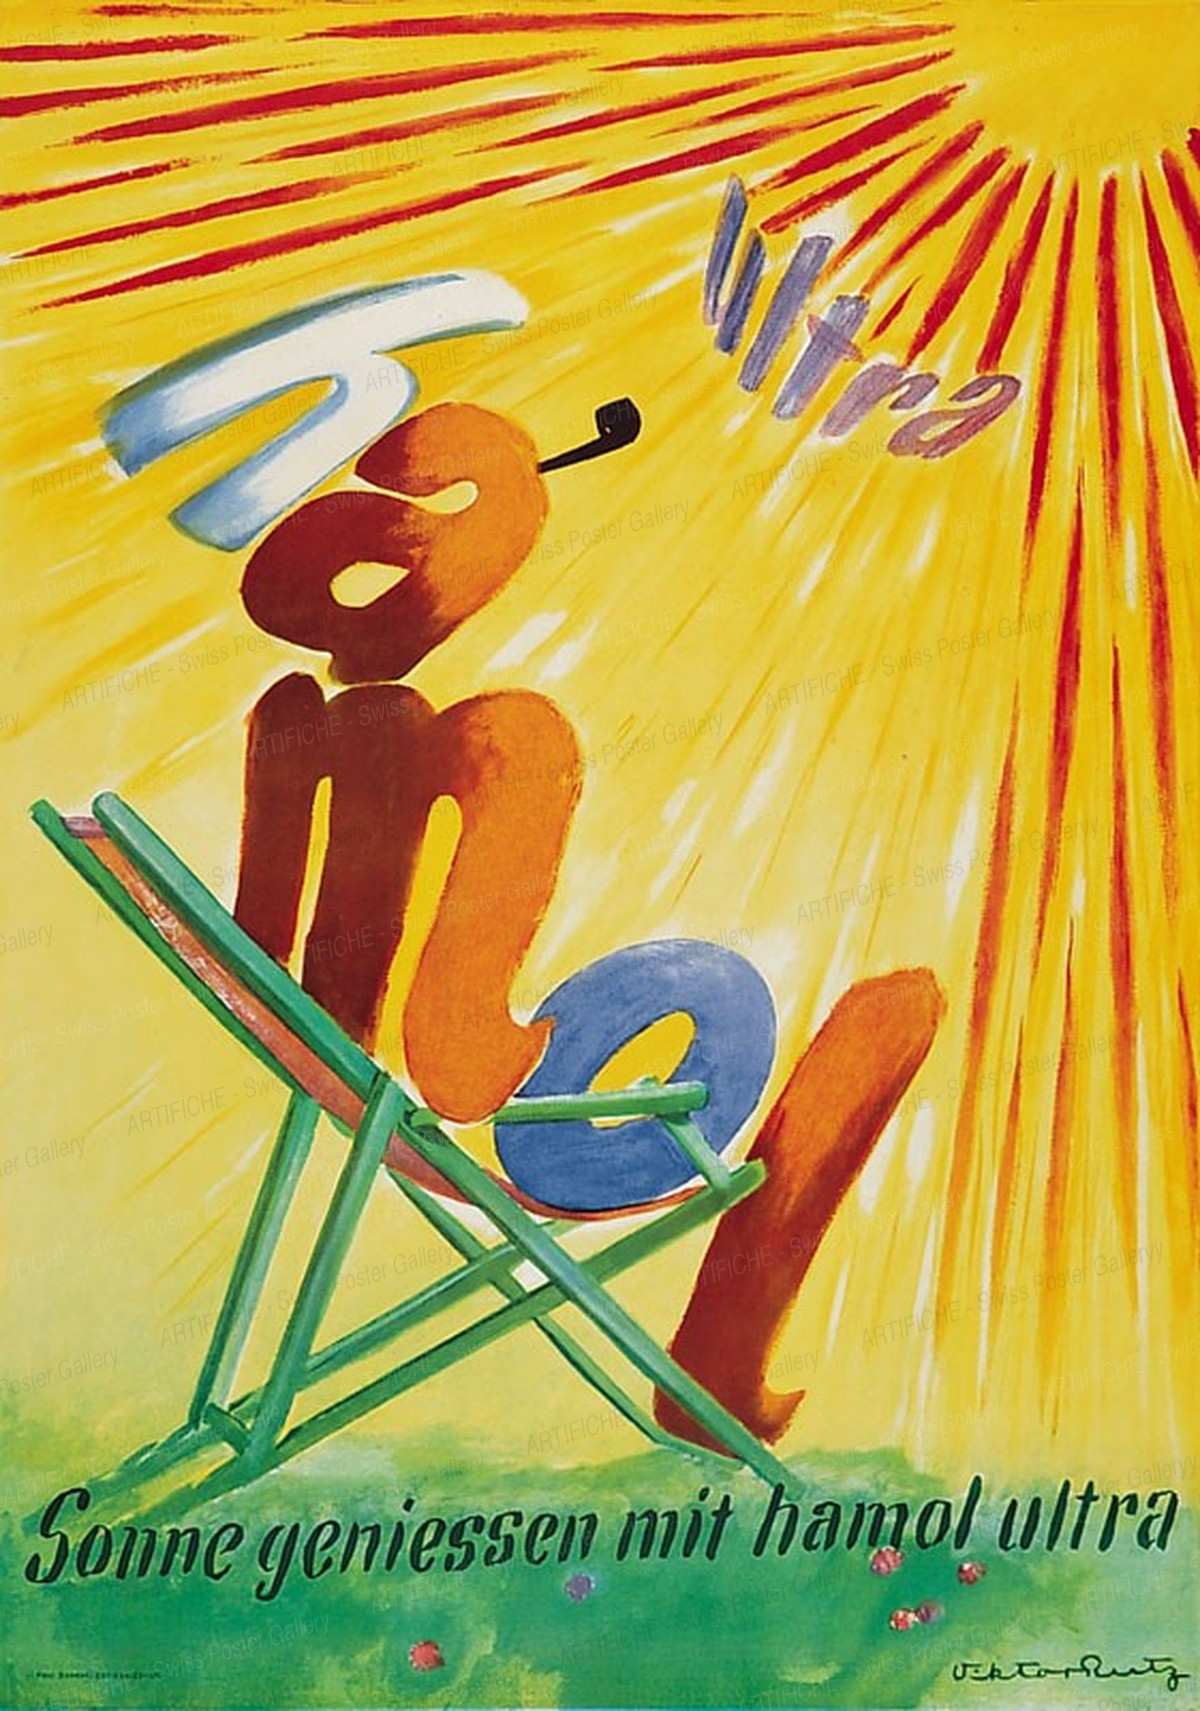 Hamol – Sonne geniessen mit hamol ultra, Viktor Rutz